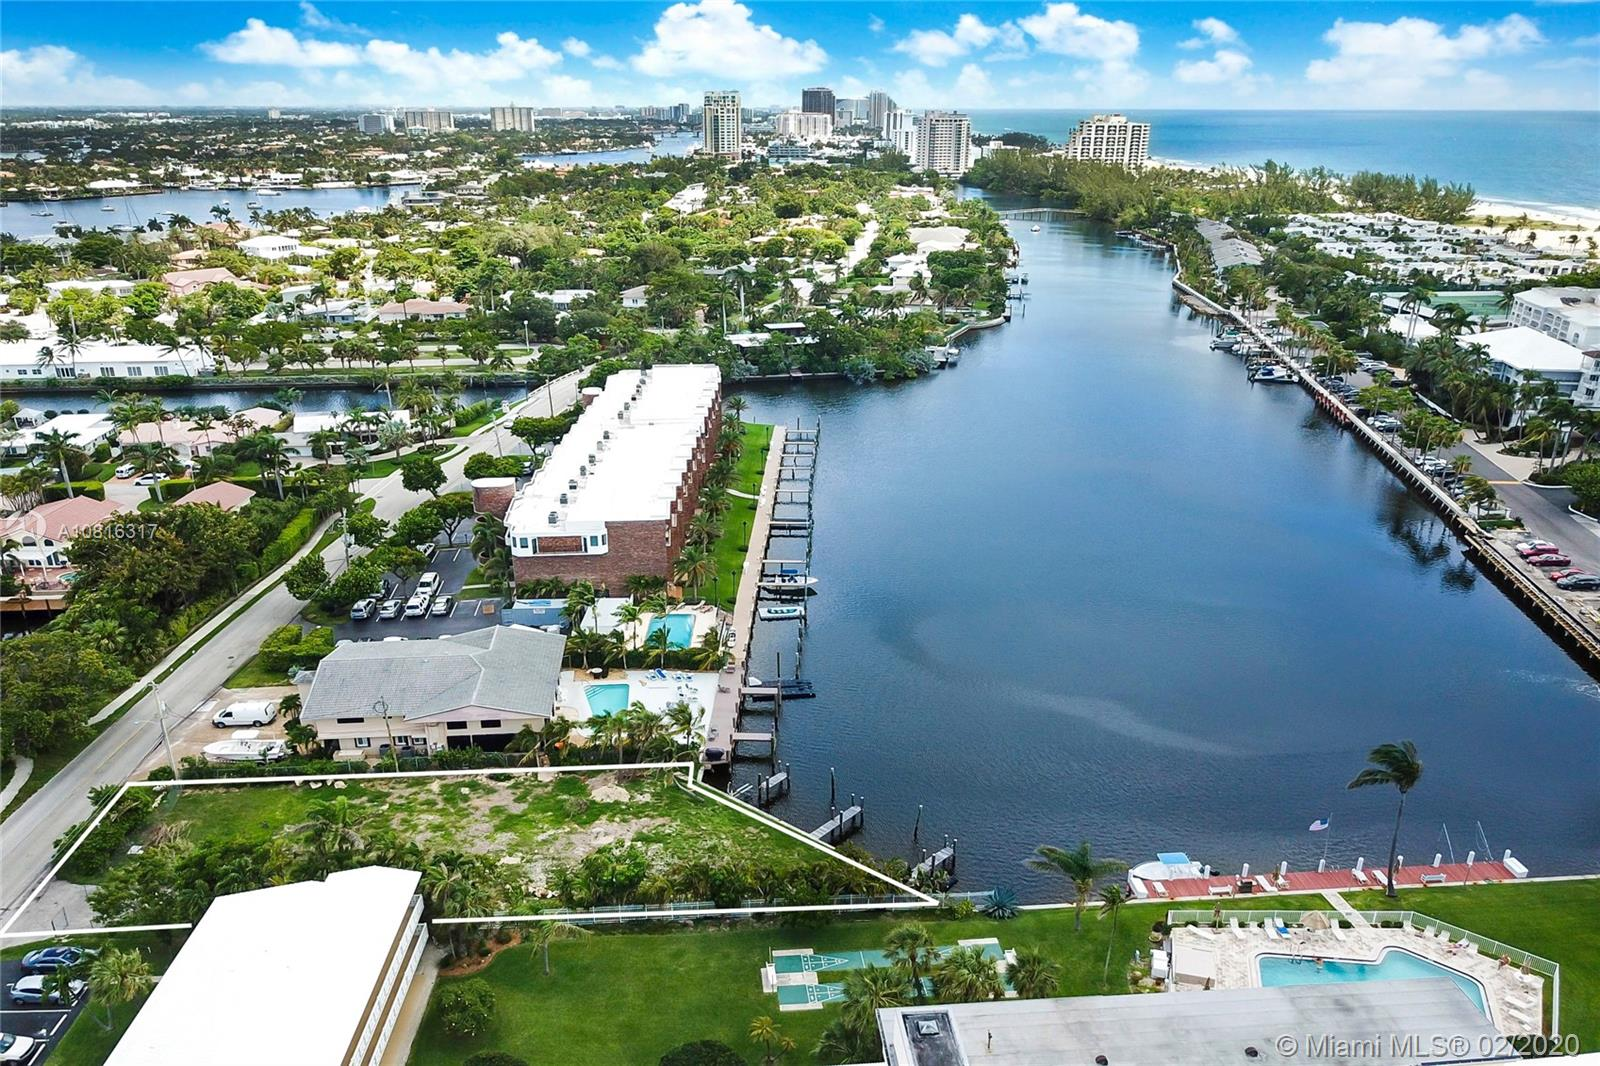 1832 S OCEAN DR, Fort Lauderdale, FL 33316